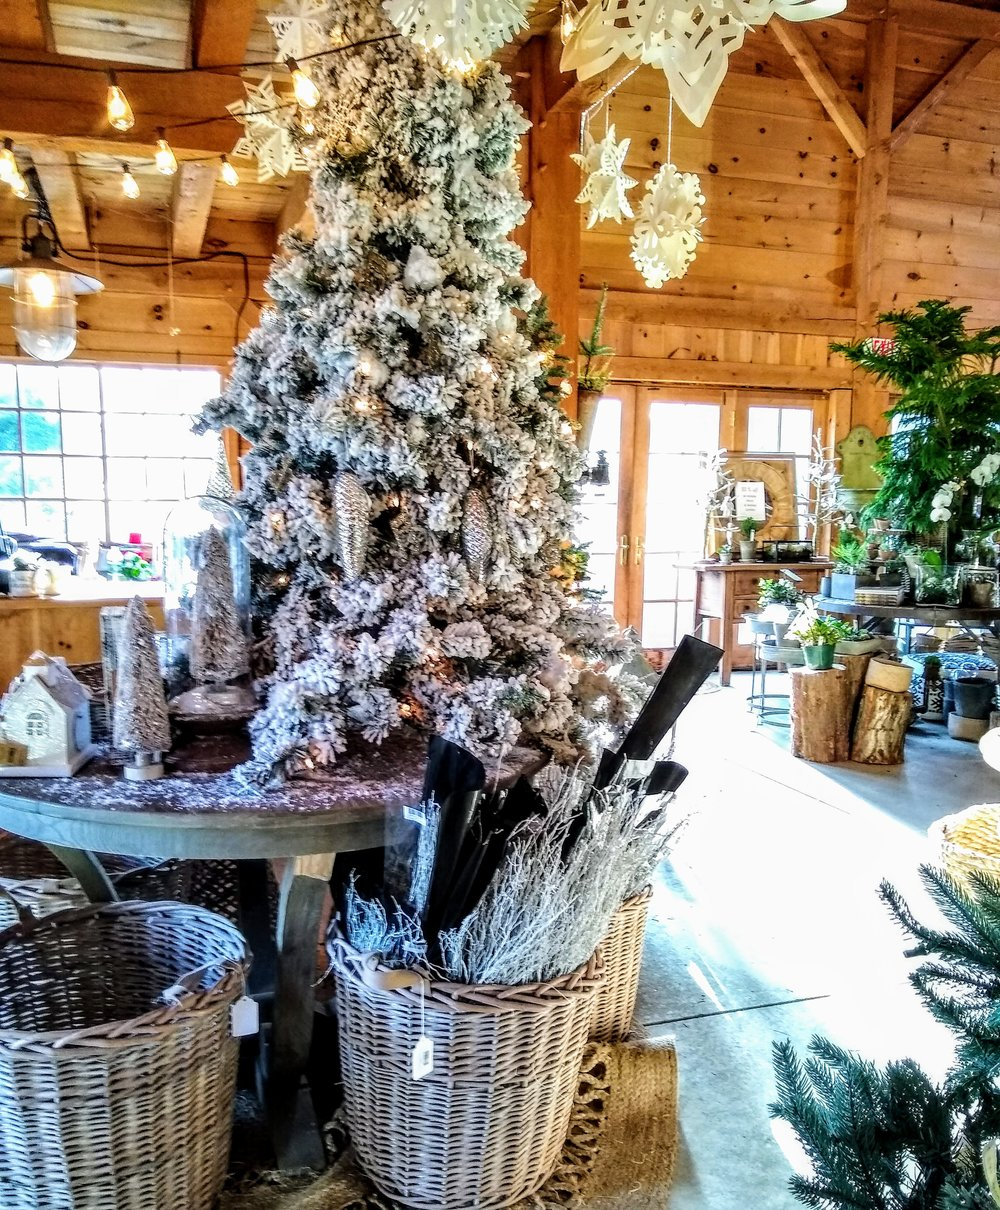 Herbary-ChristmasTrees.jpg